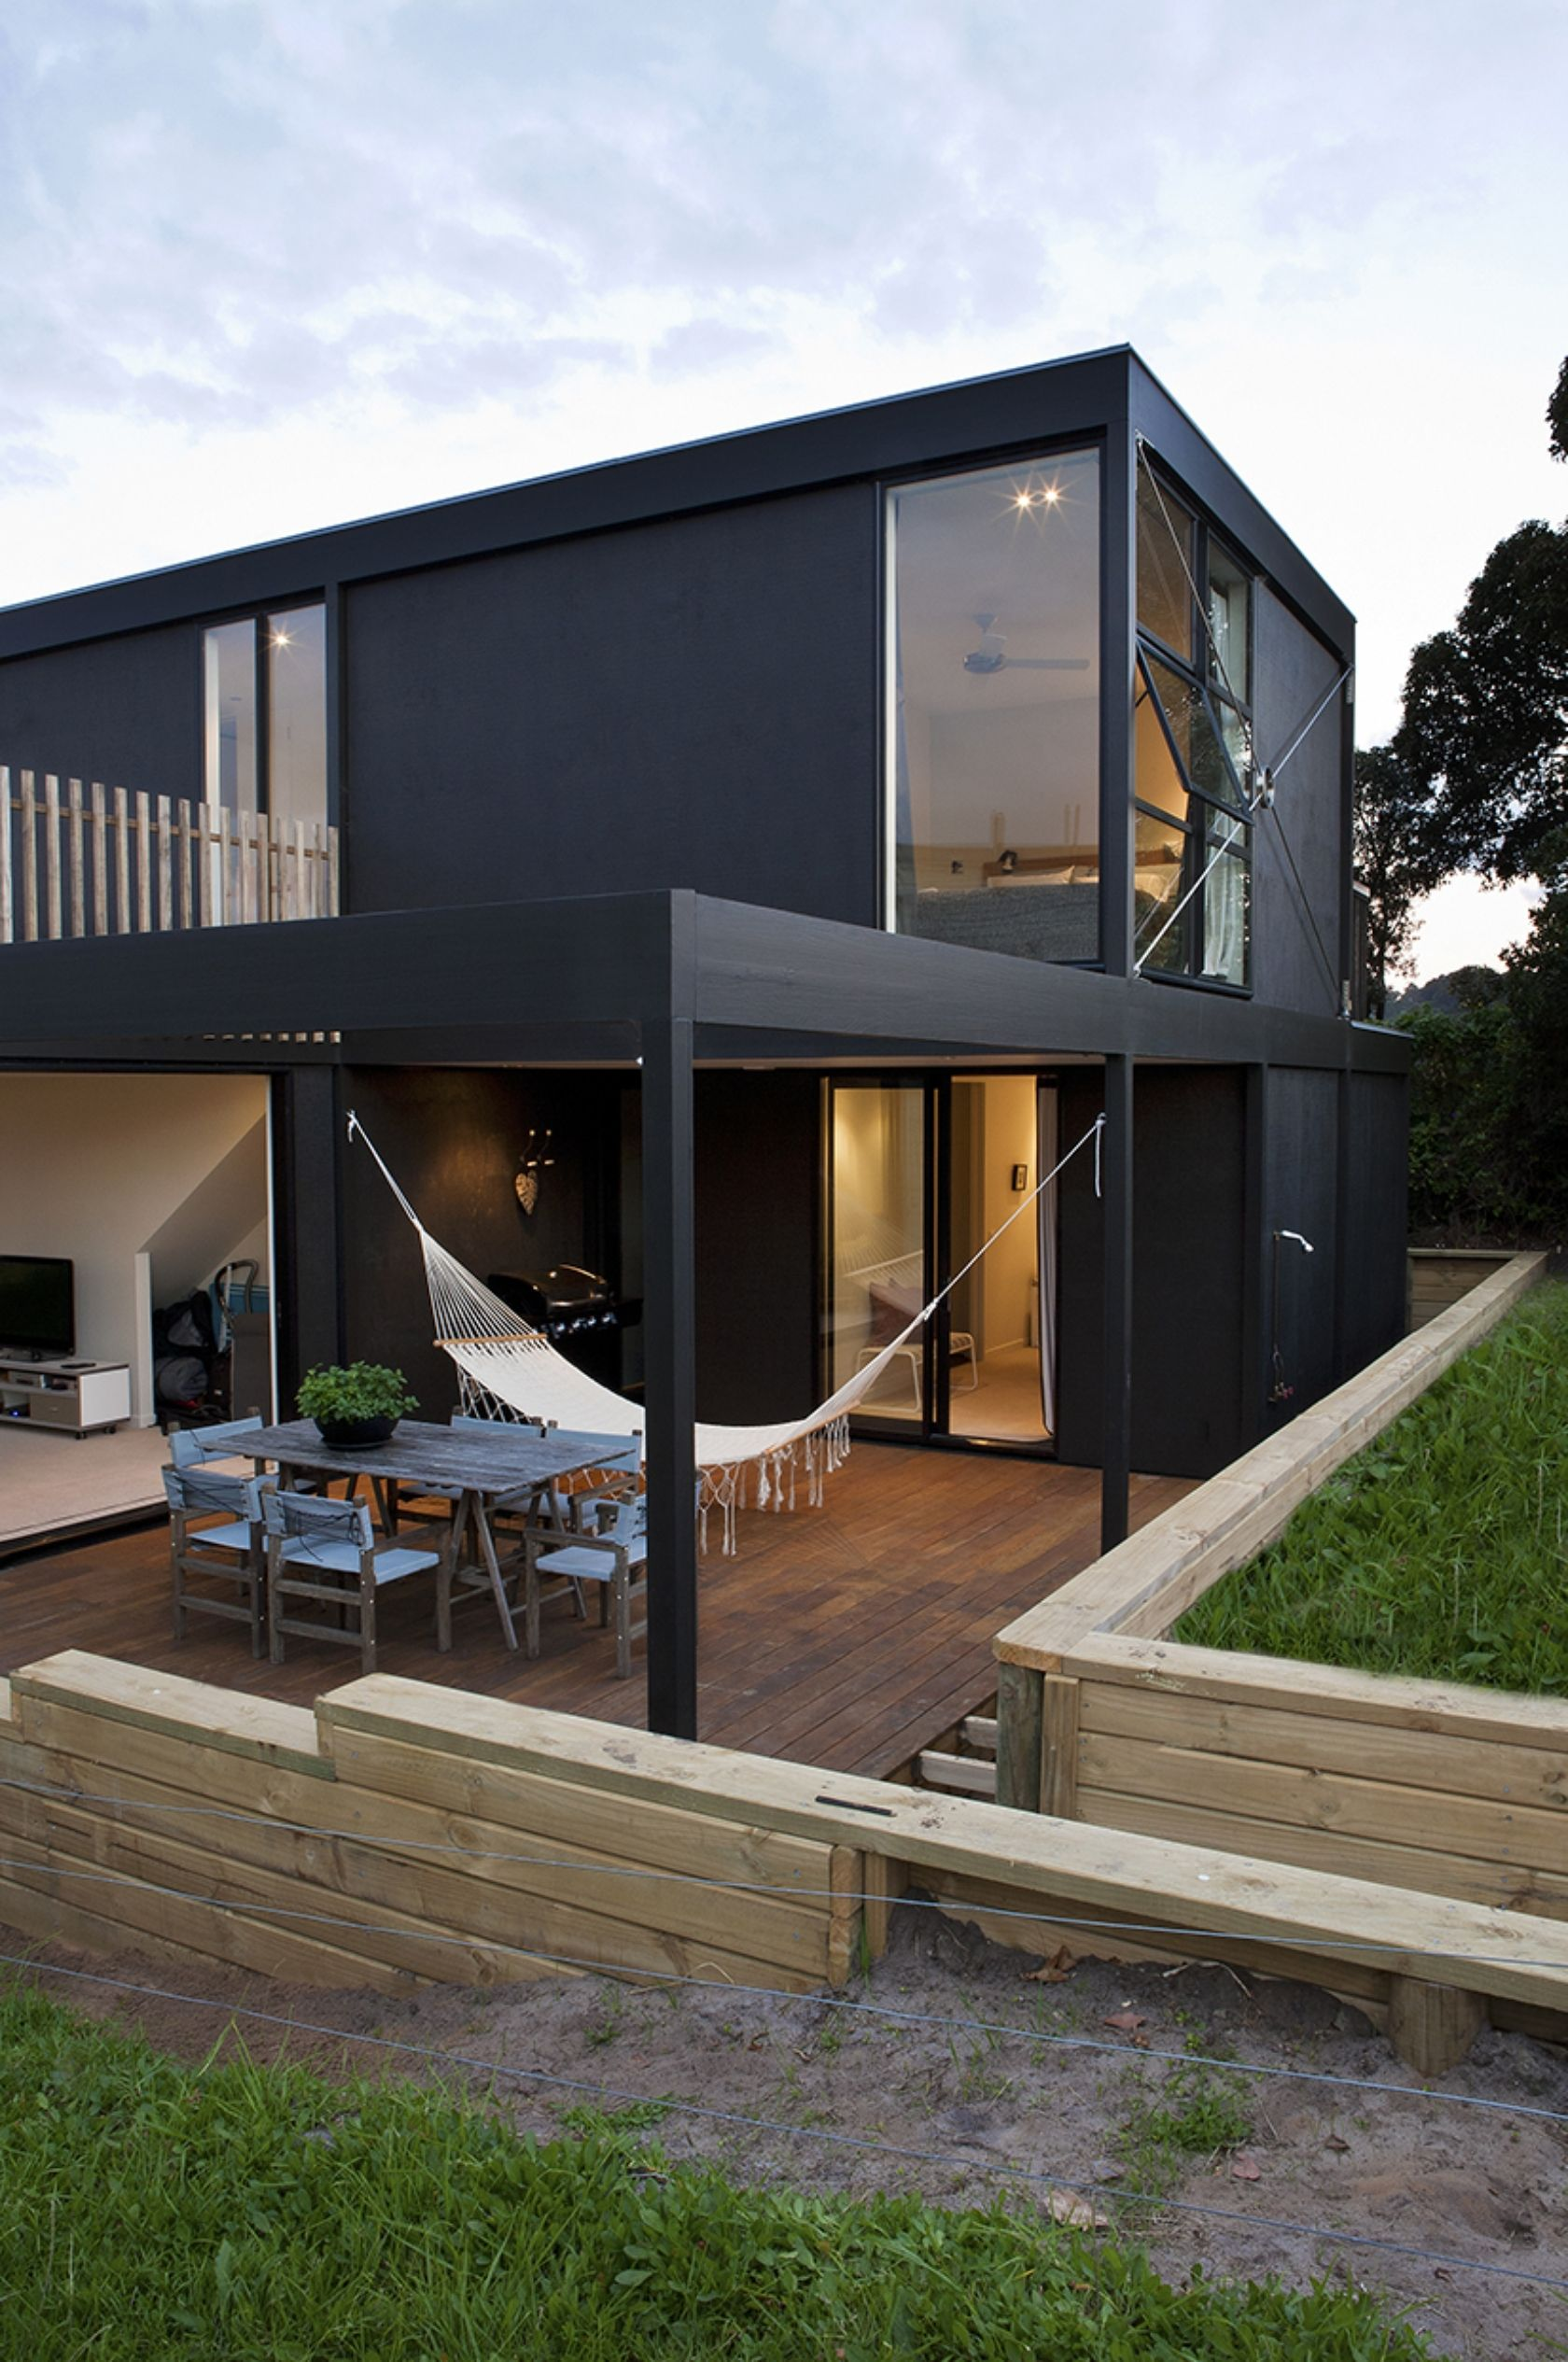 box living whangapoua beach house casa modular new zeland arquiloucos pinterest boxing. Black Bedroom Furniture Sets. Home Design Ideas